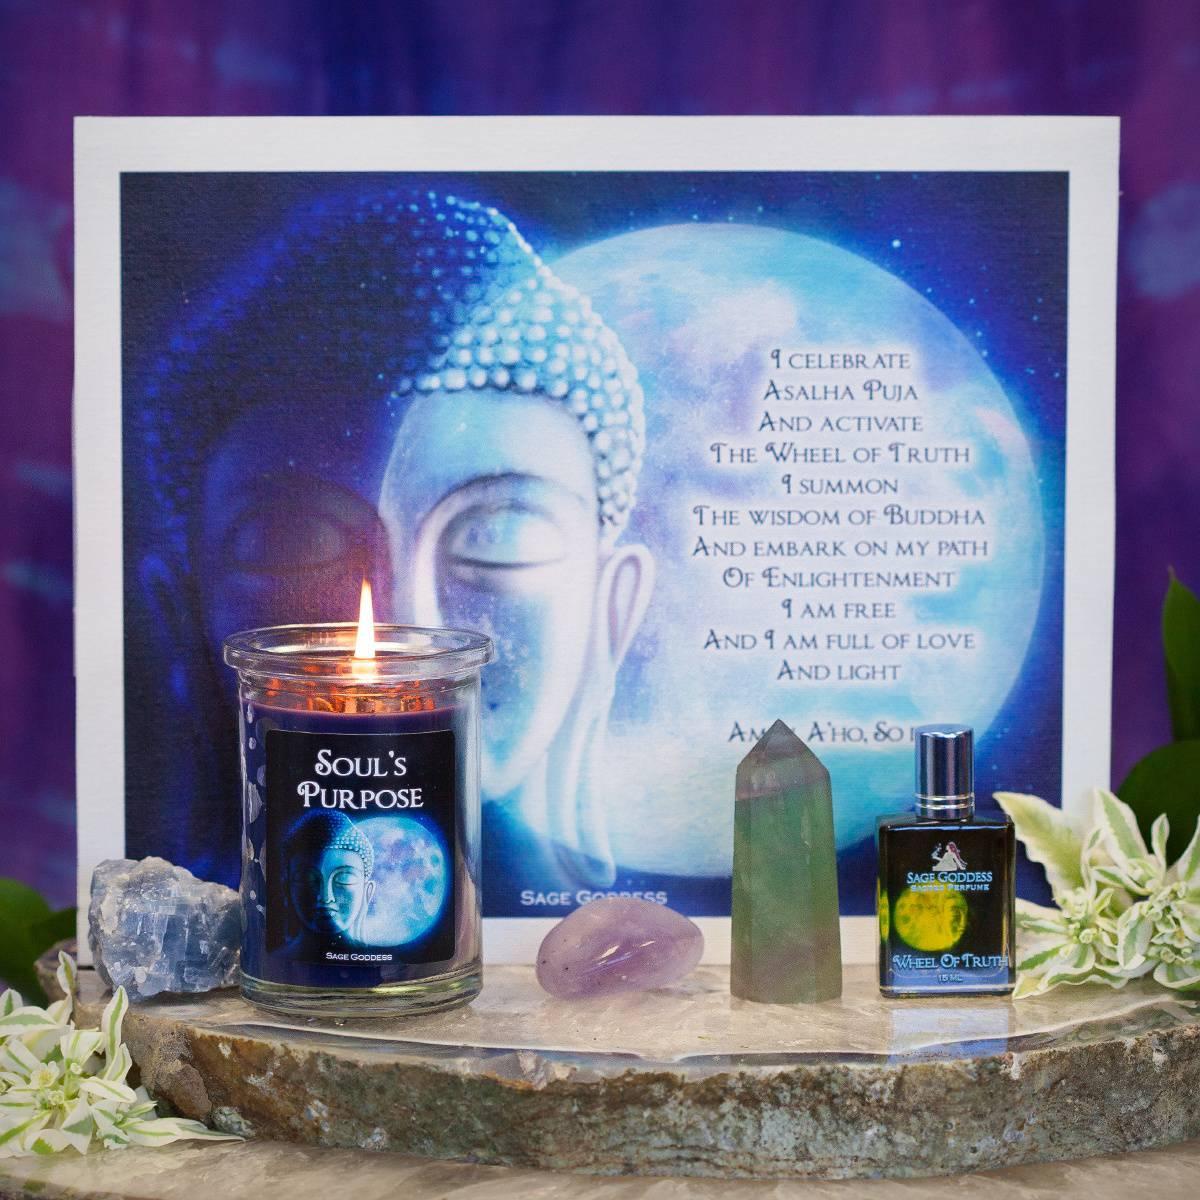 Tibetan_Full_Moon_Dharma_Day_1of4_6_28